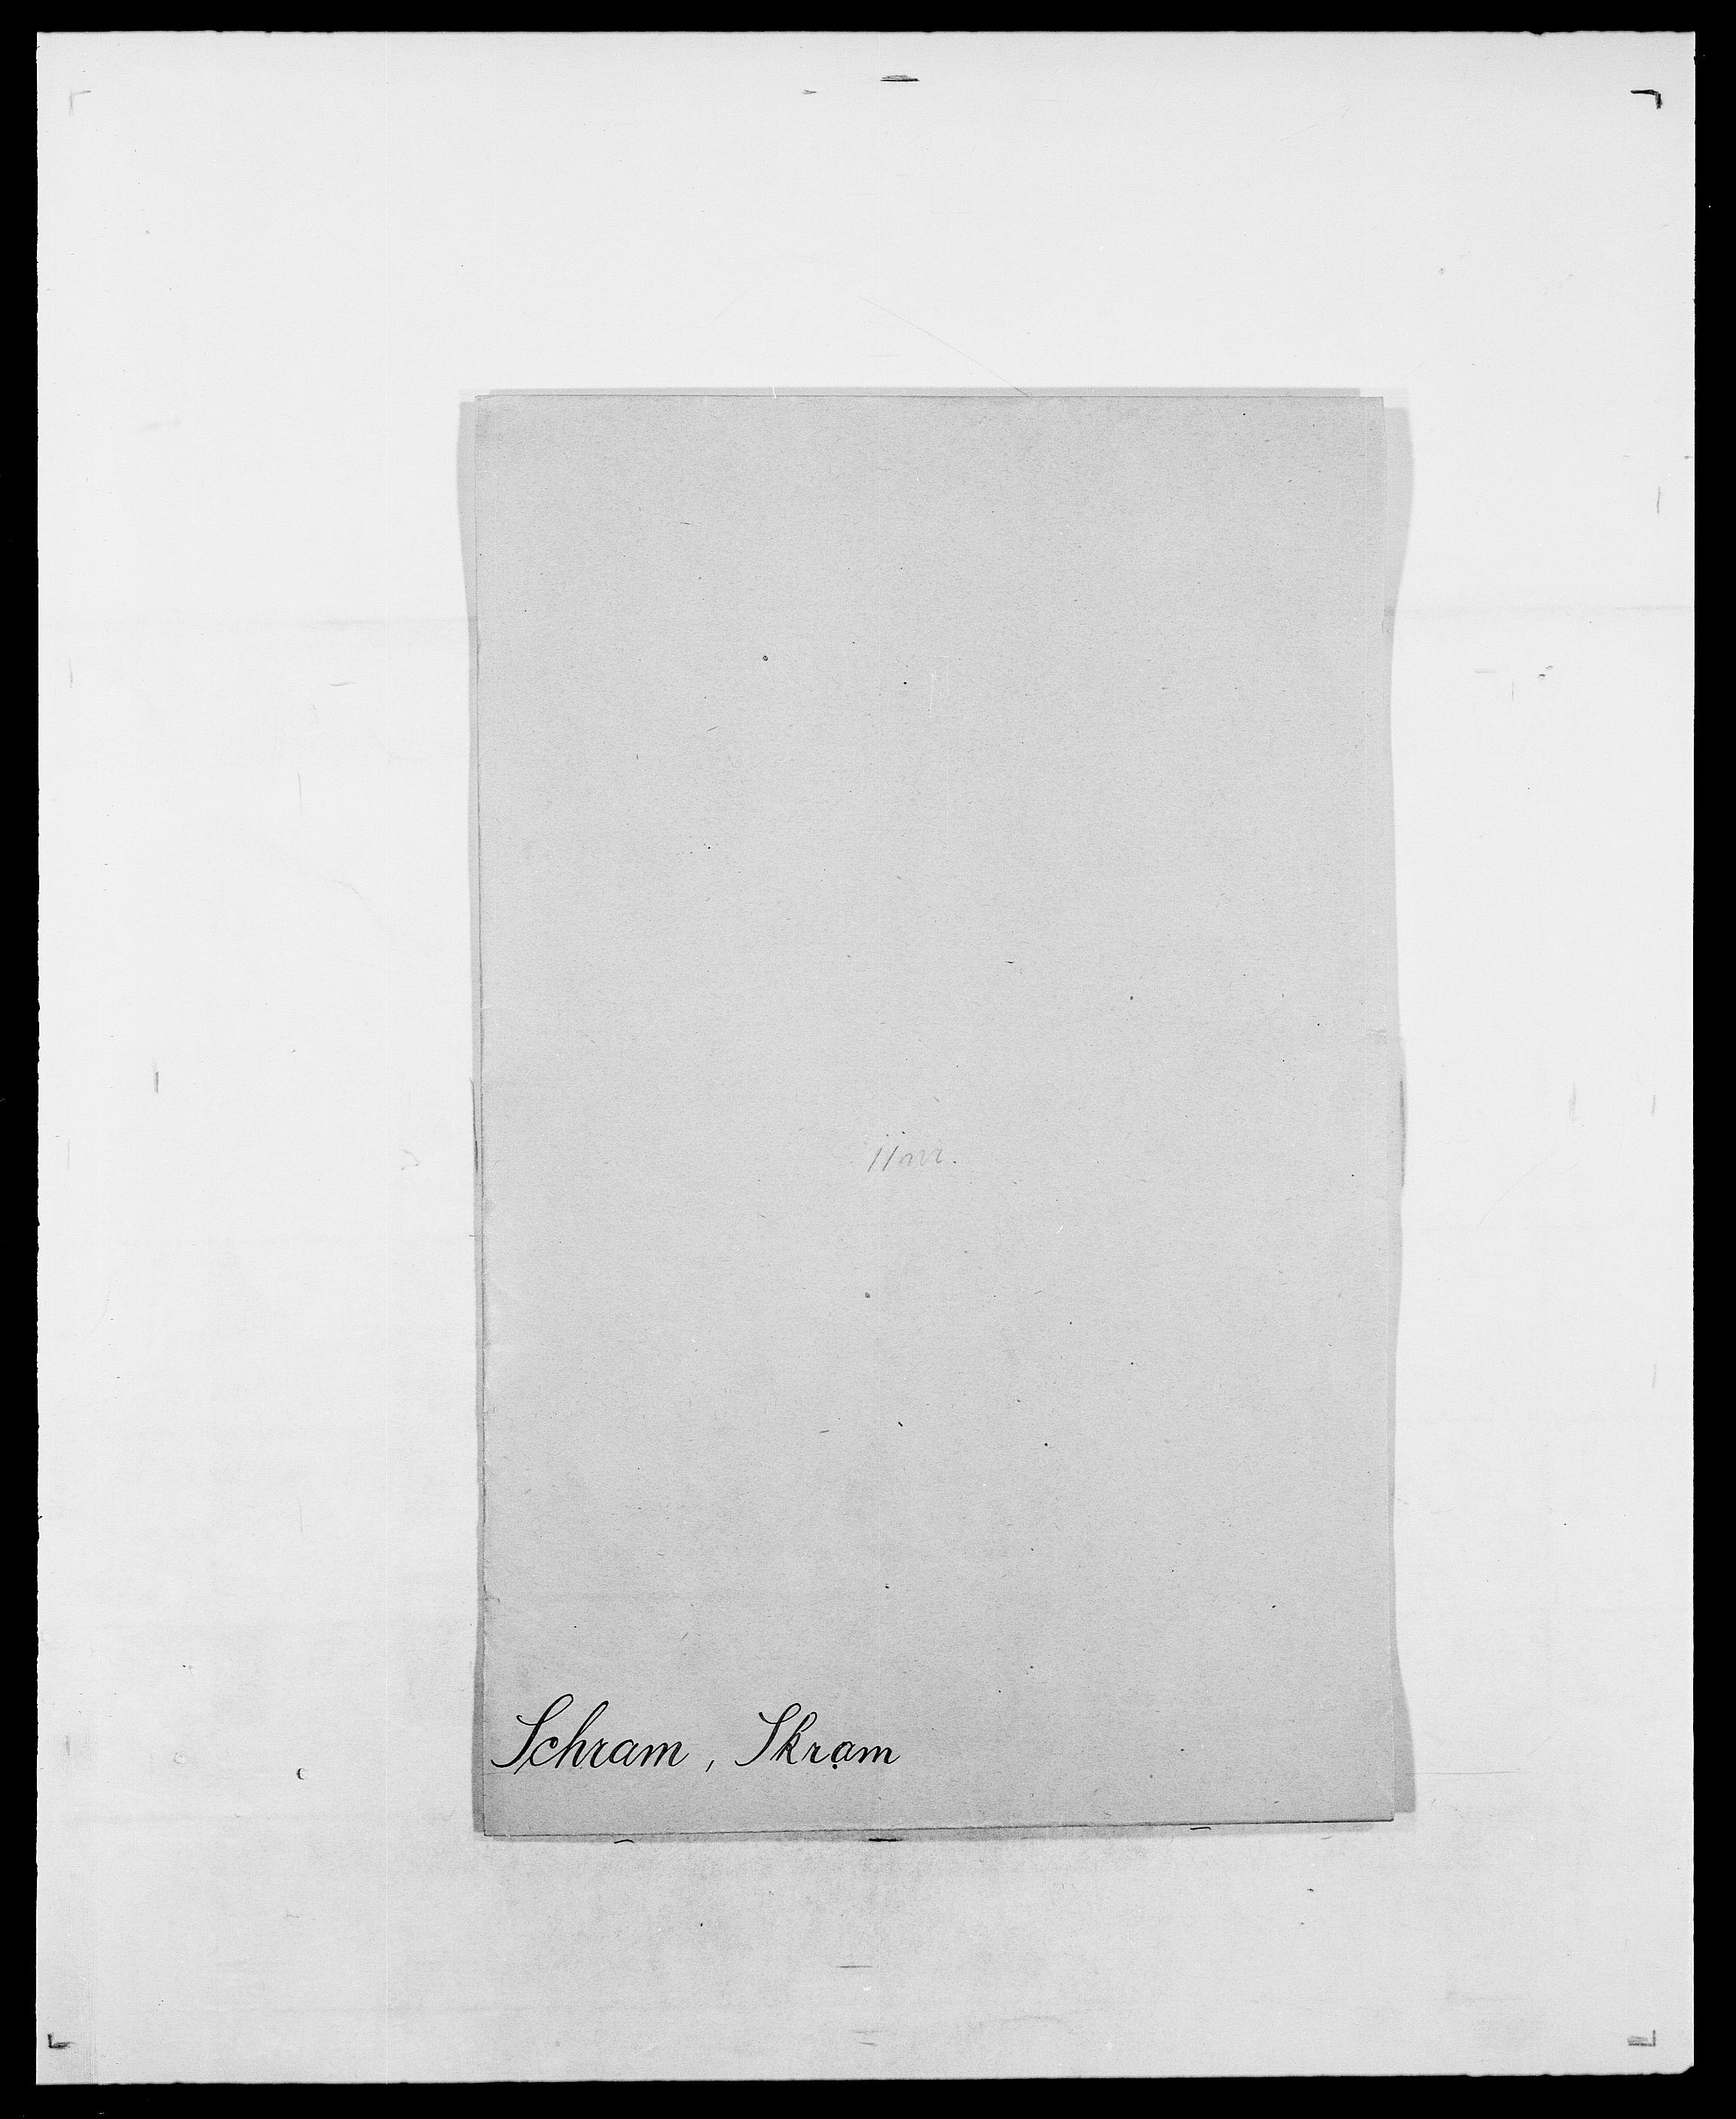 SAO, Delgobe, Charles Antoine - samling, D/Da/L0035: Schnabel - sjetman, s. 120